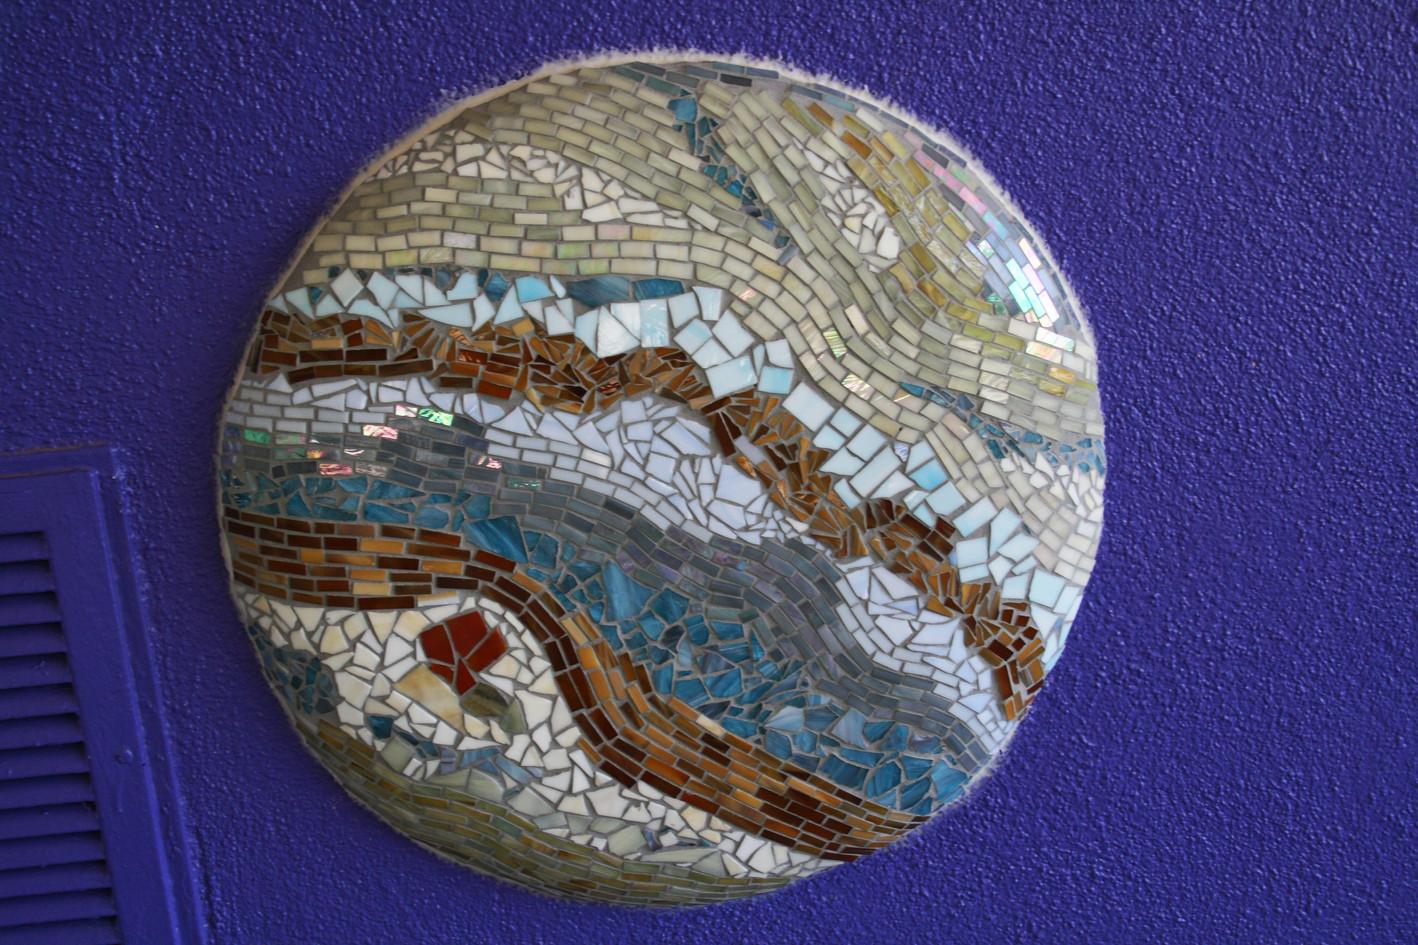 Mosaic Jupiter at Hedrick Elementary School